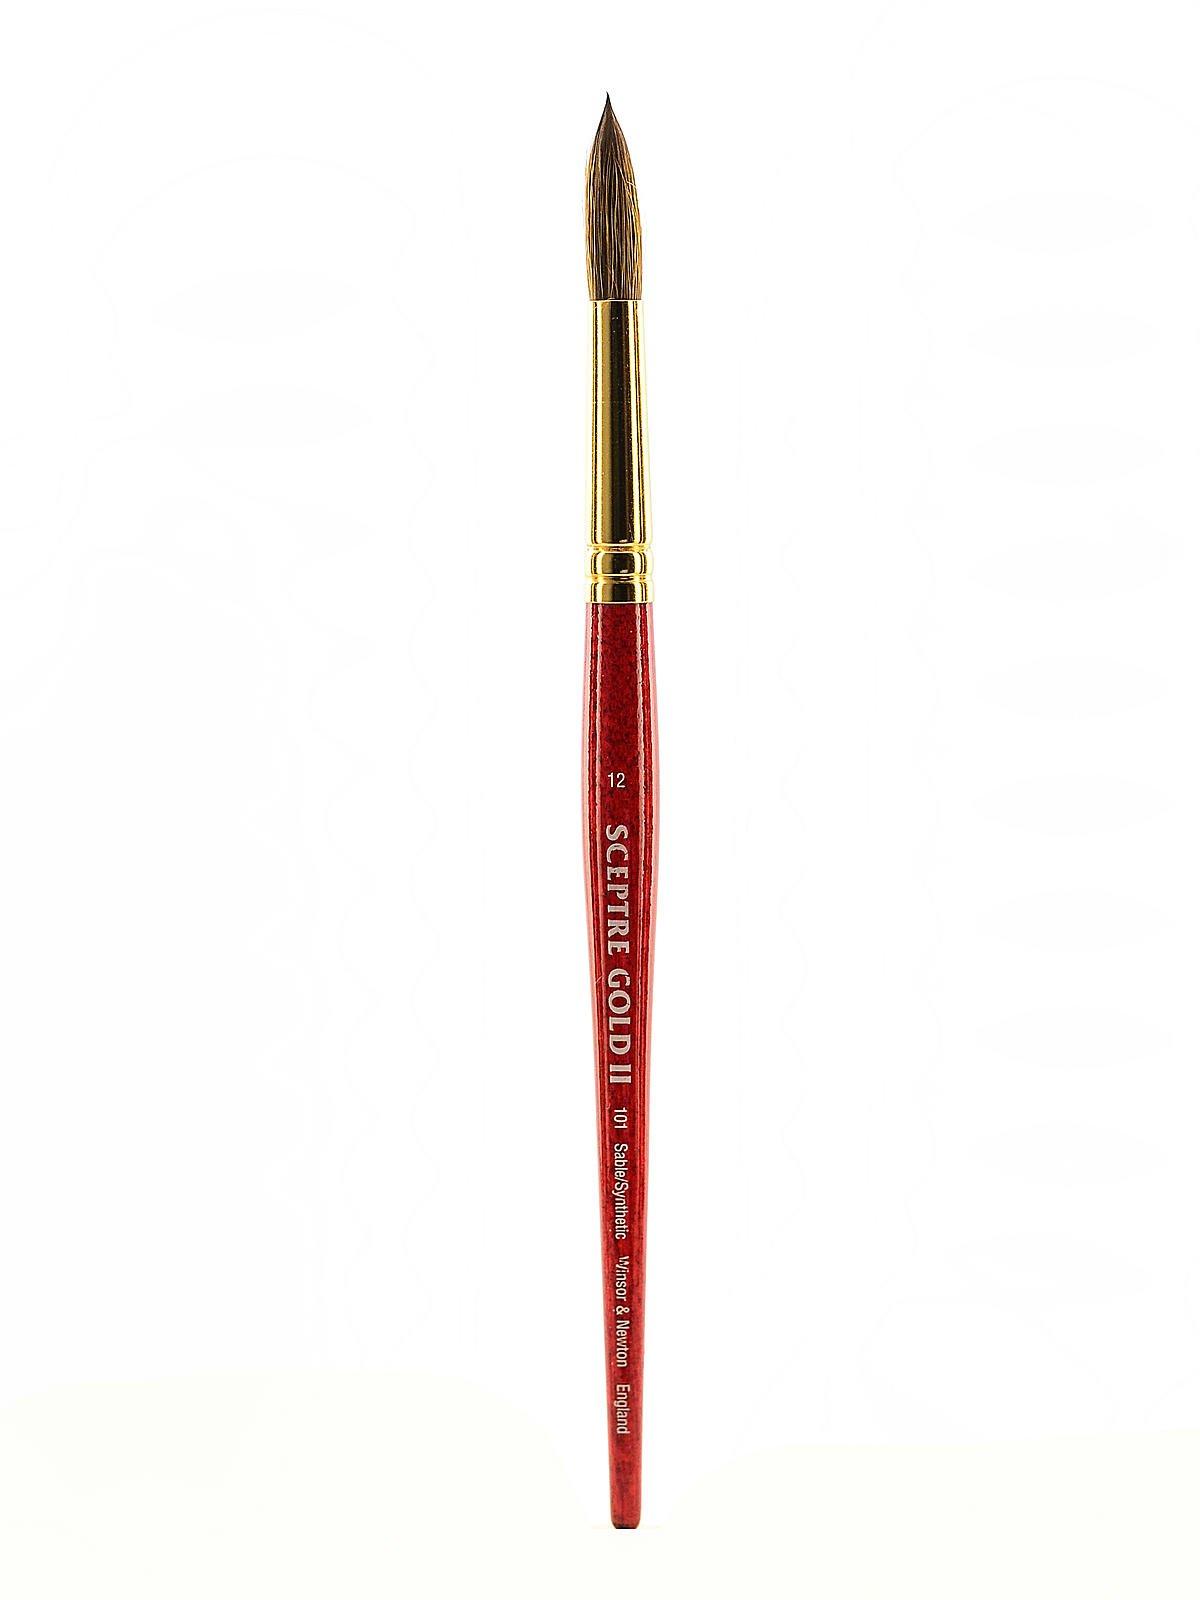 Winsor and Newton Sceptre Gold II Brush Round-Short